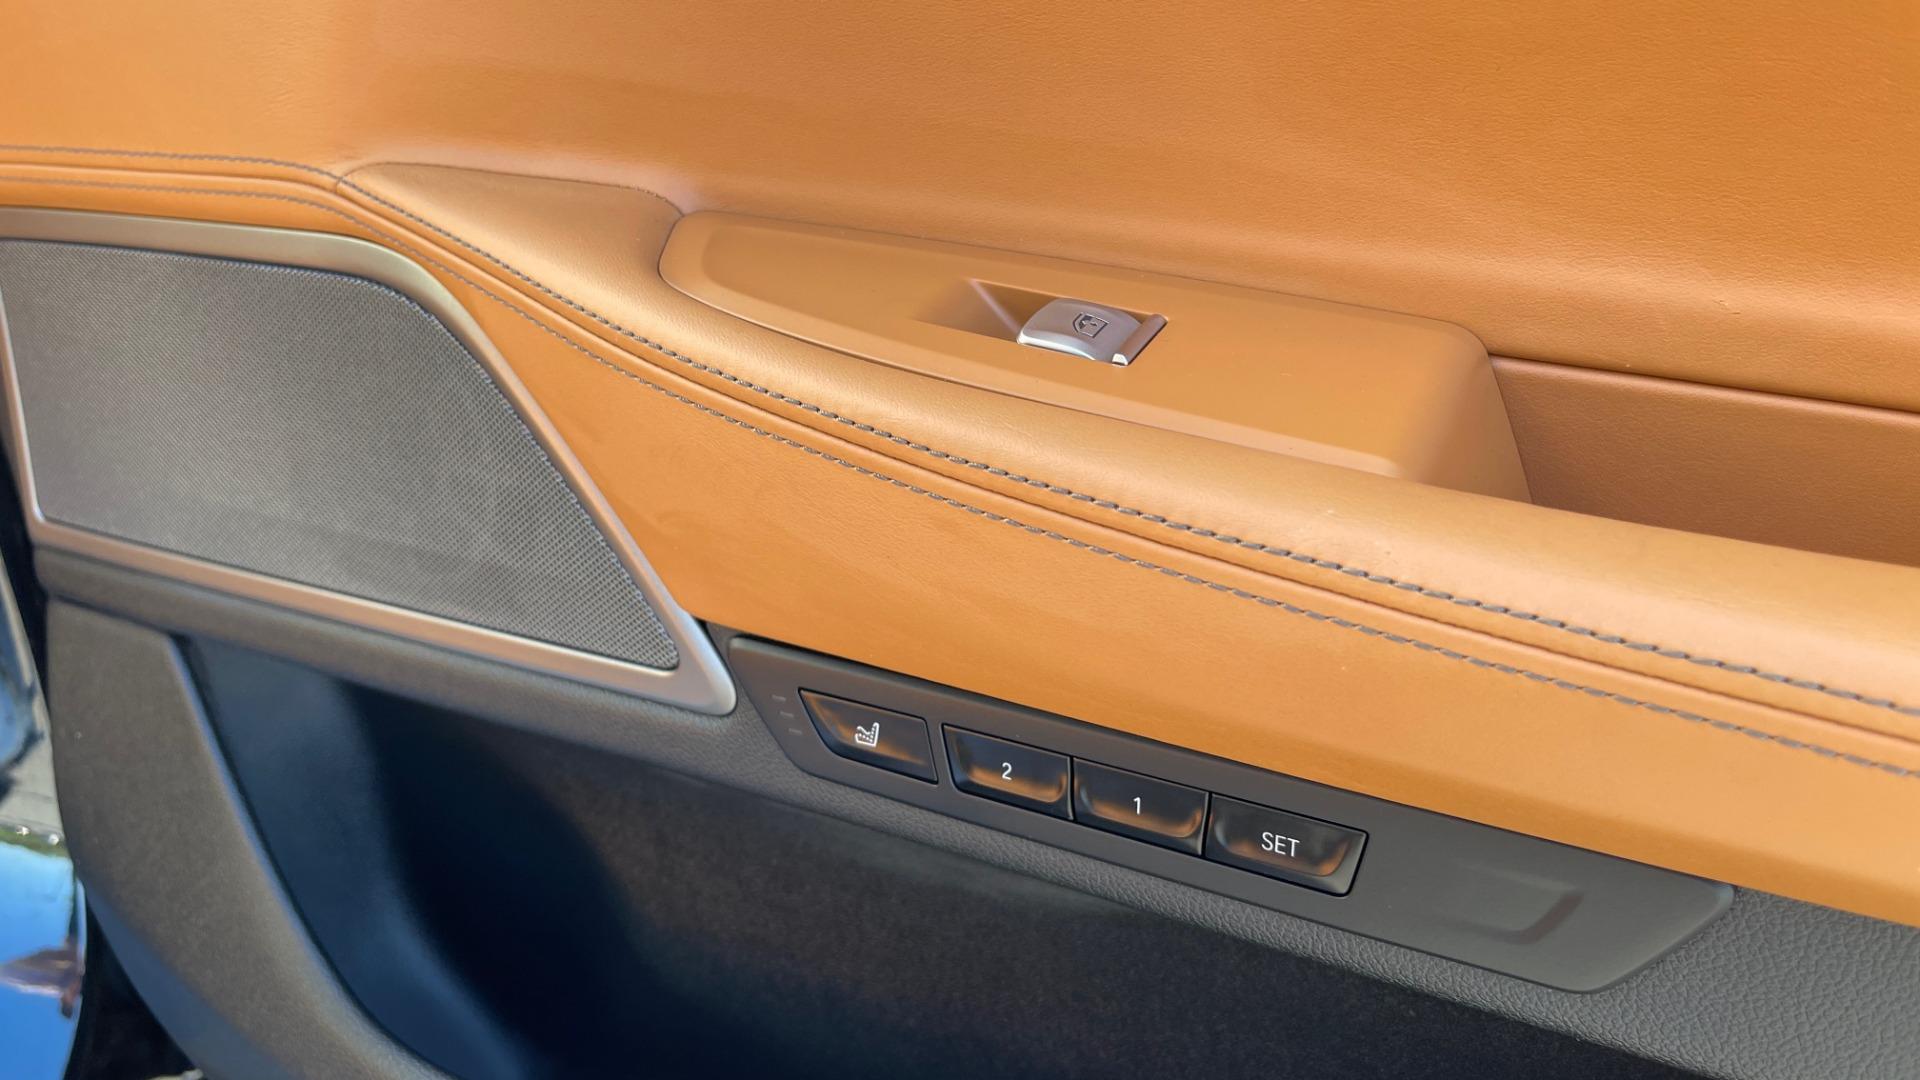 Used 2019 BMW 7 SERIES 750I XDRIVE M-SPORT / EXEC PKG / DRVR ASST PLUS / CLD WTHR / PAR for sale $60,995 at Formula Imports in Charlotte NC 28227 54